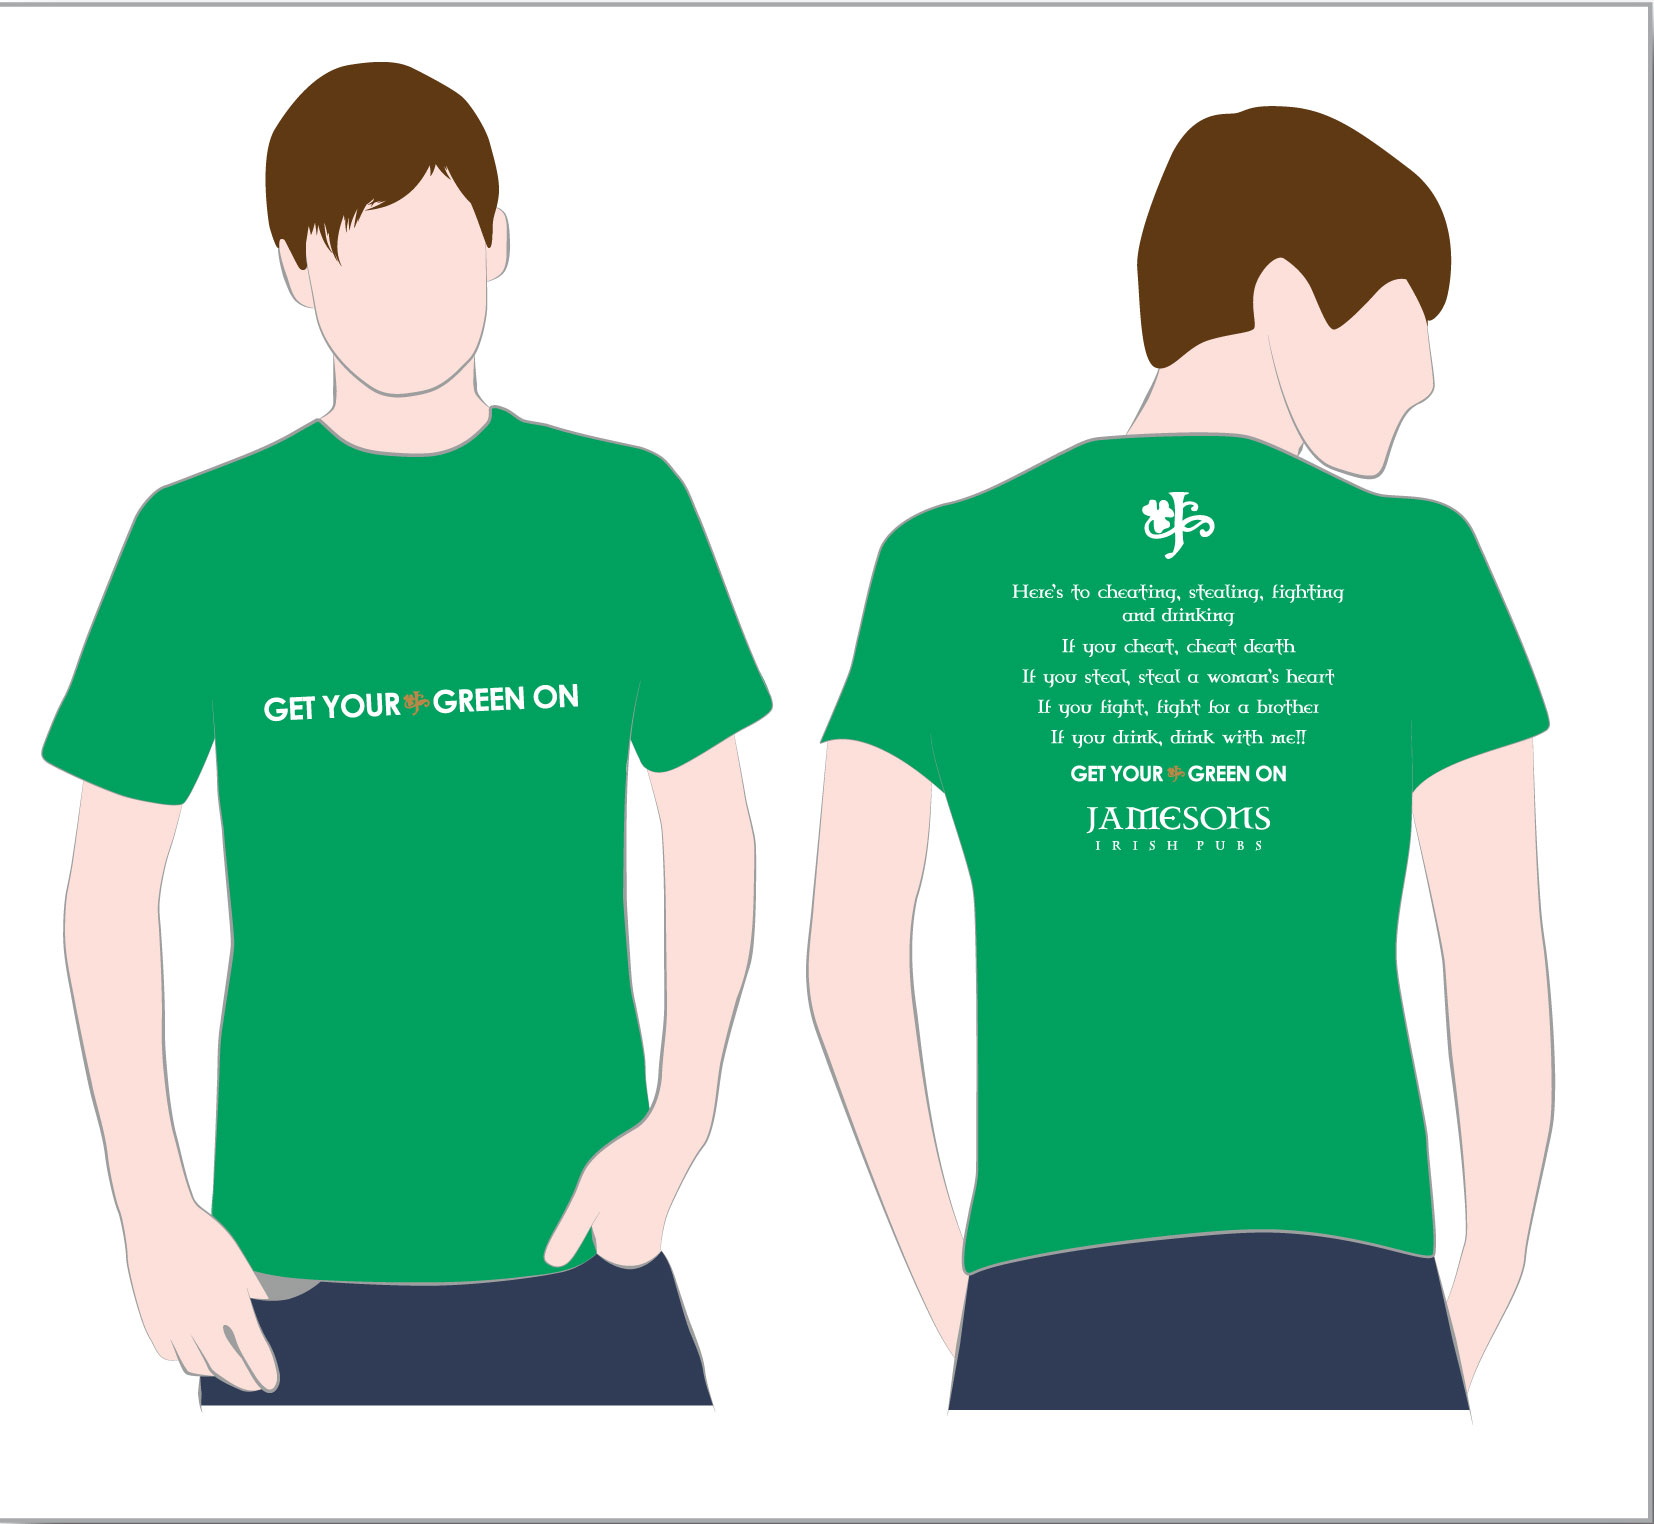 0a6918ed1 St. Patrick's Day T-shirts | JAMESONS IRISH PUBS